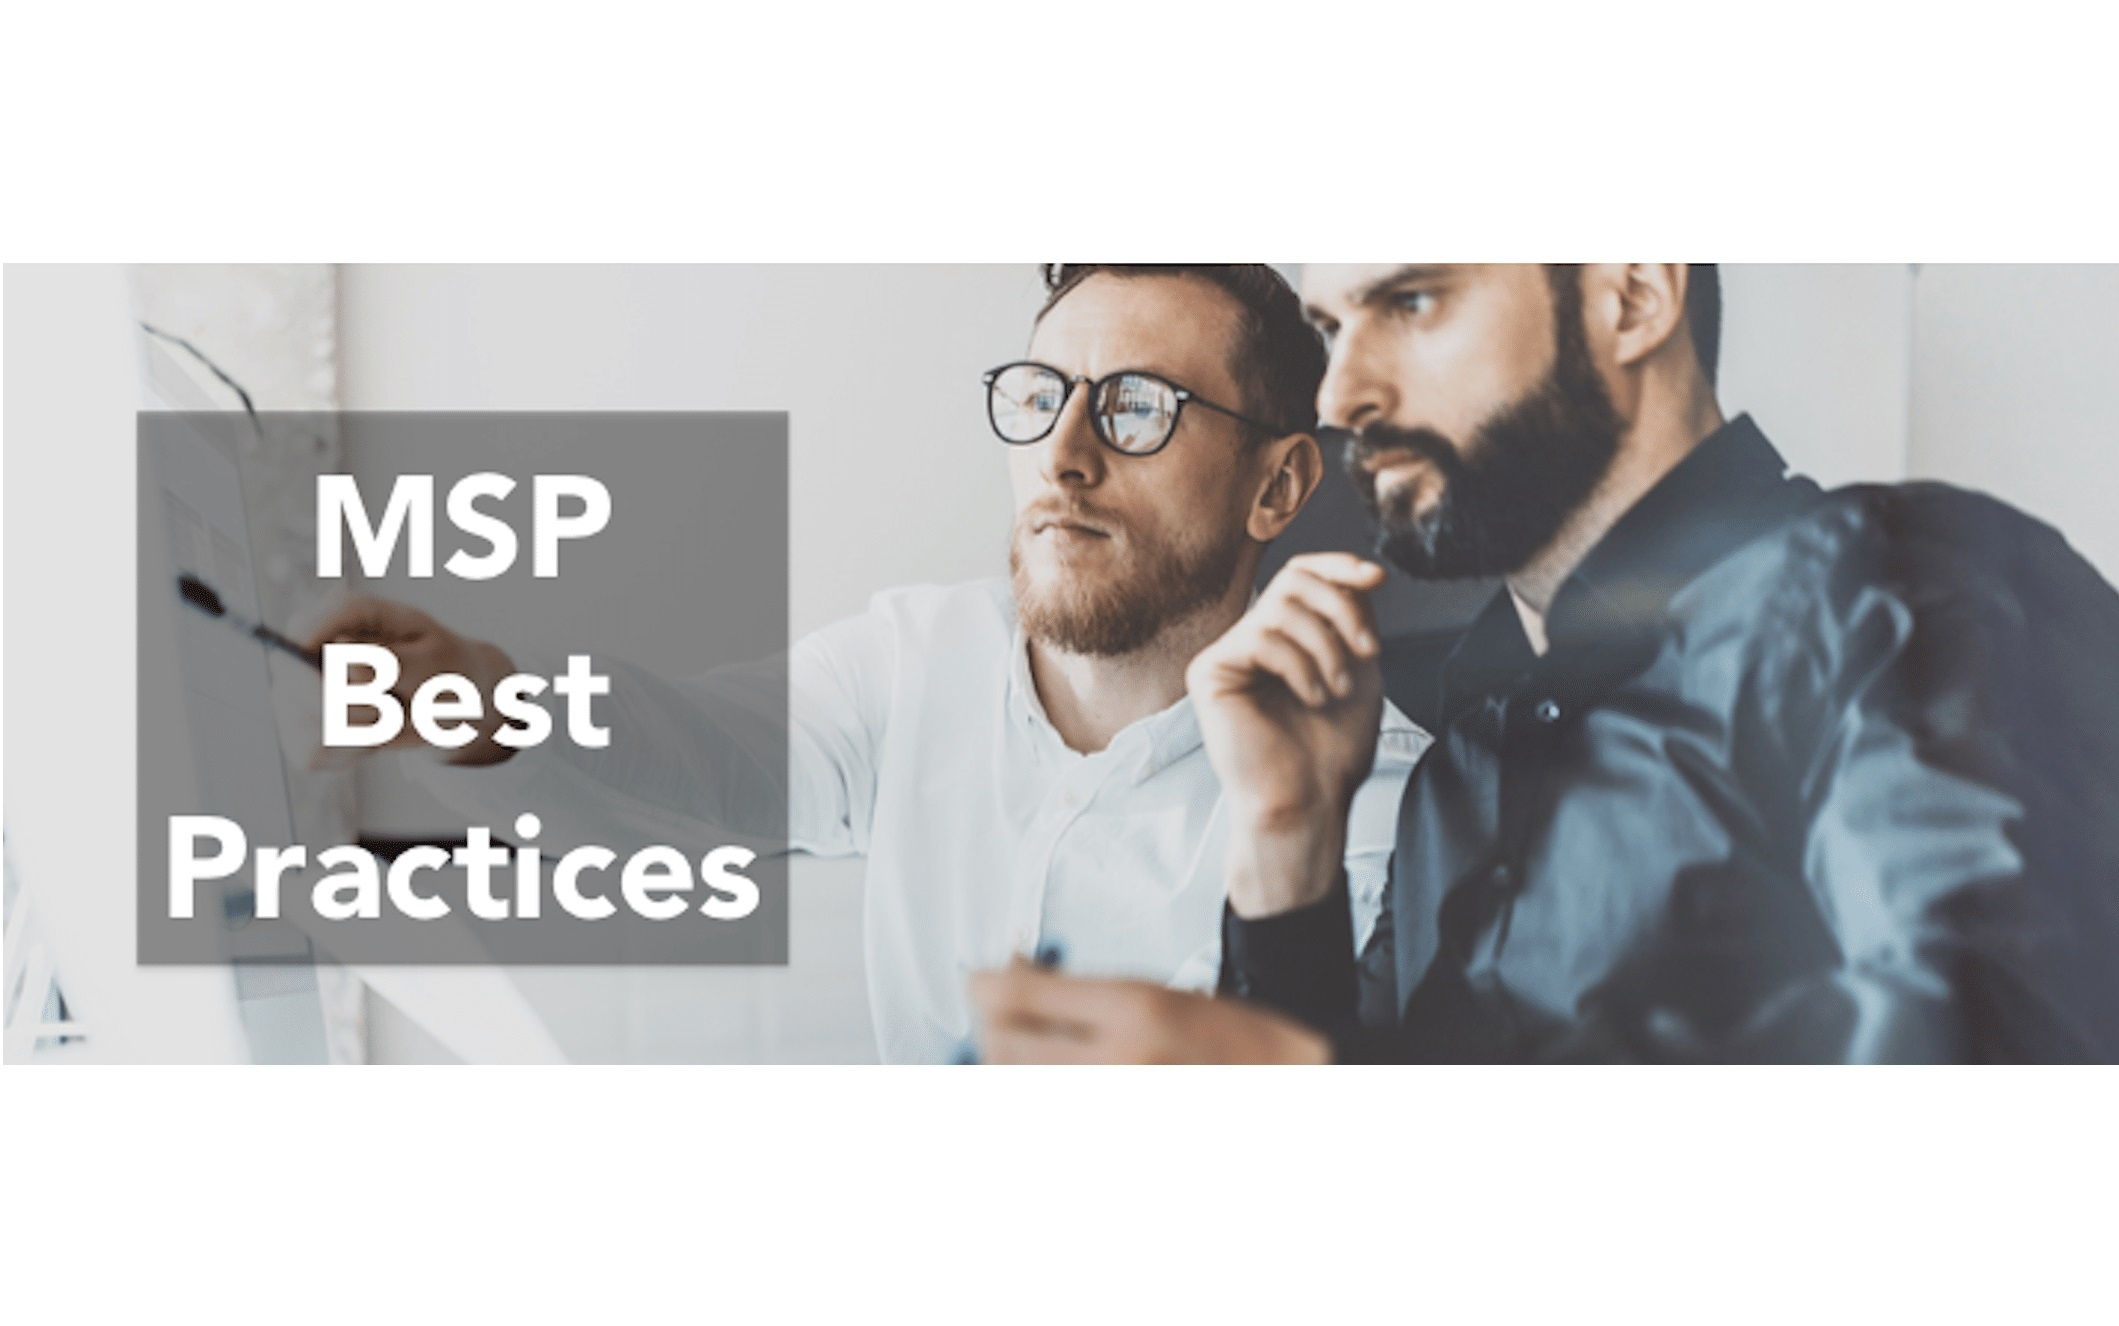 msp-best-practices thumb.jpg